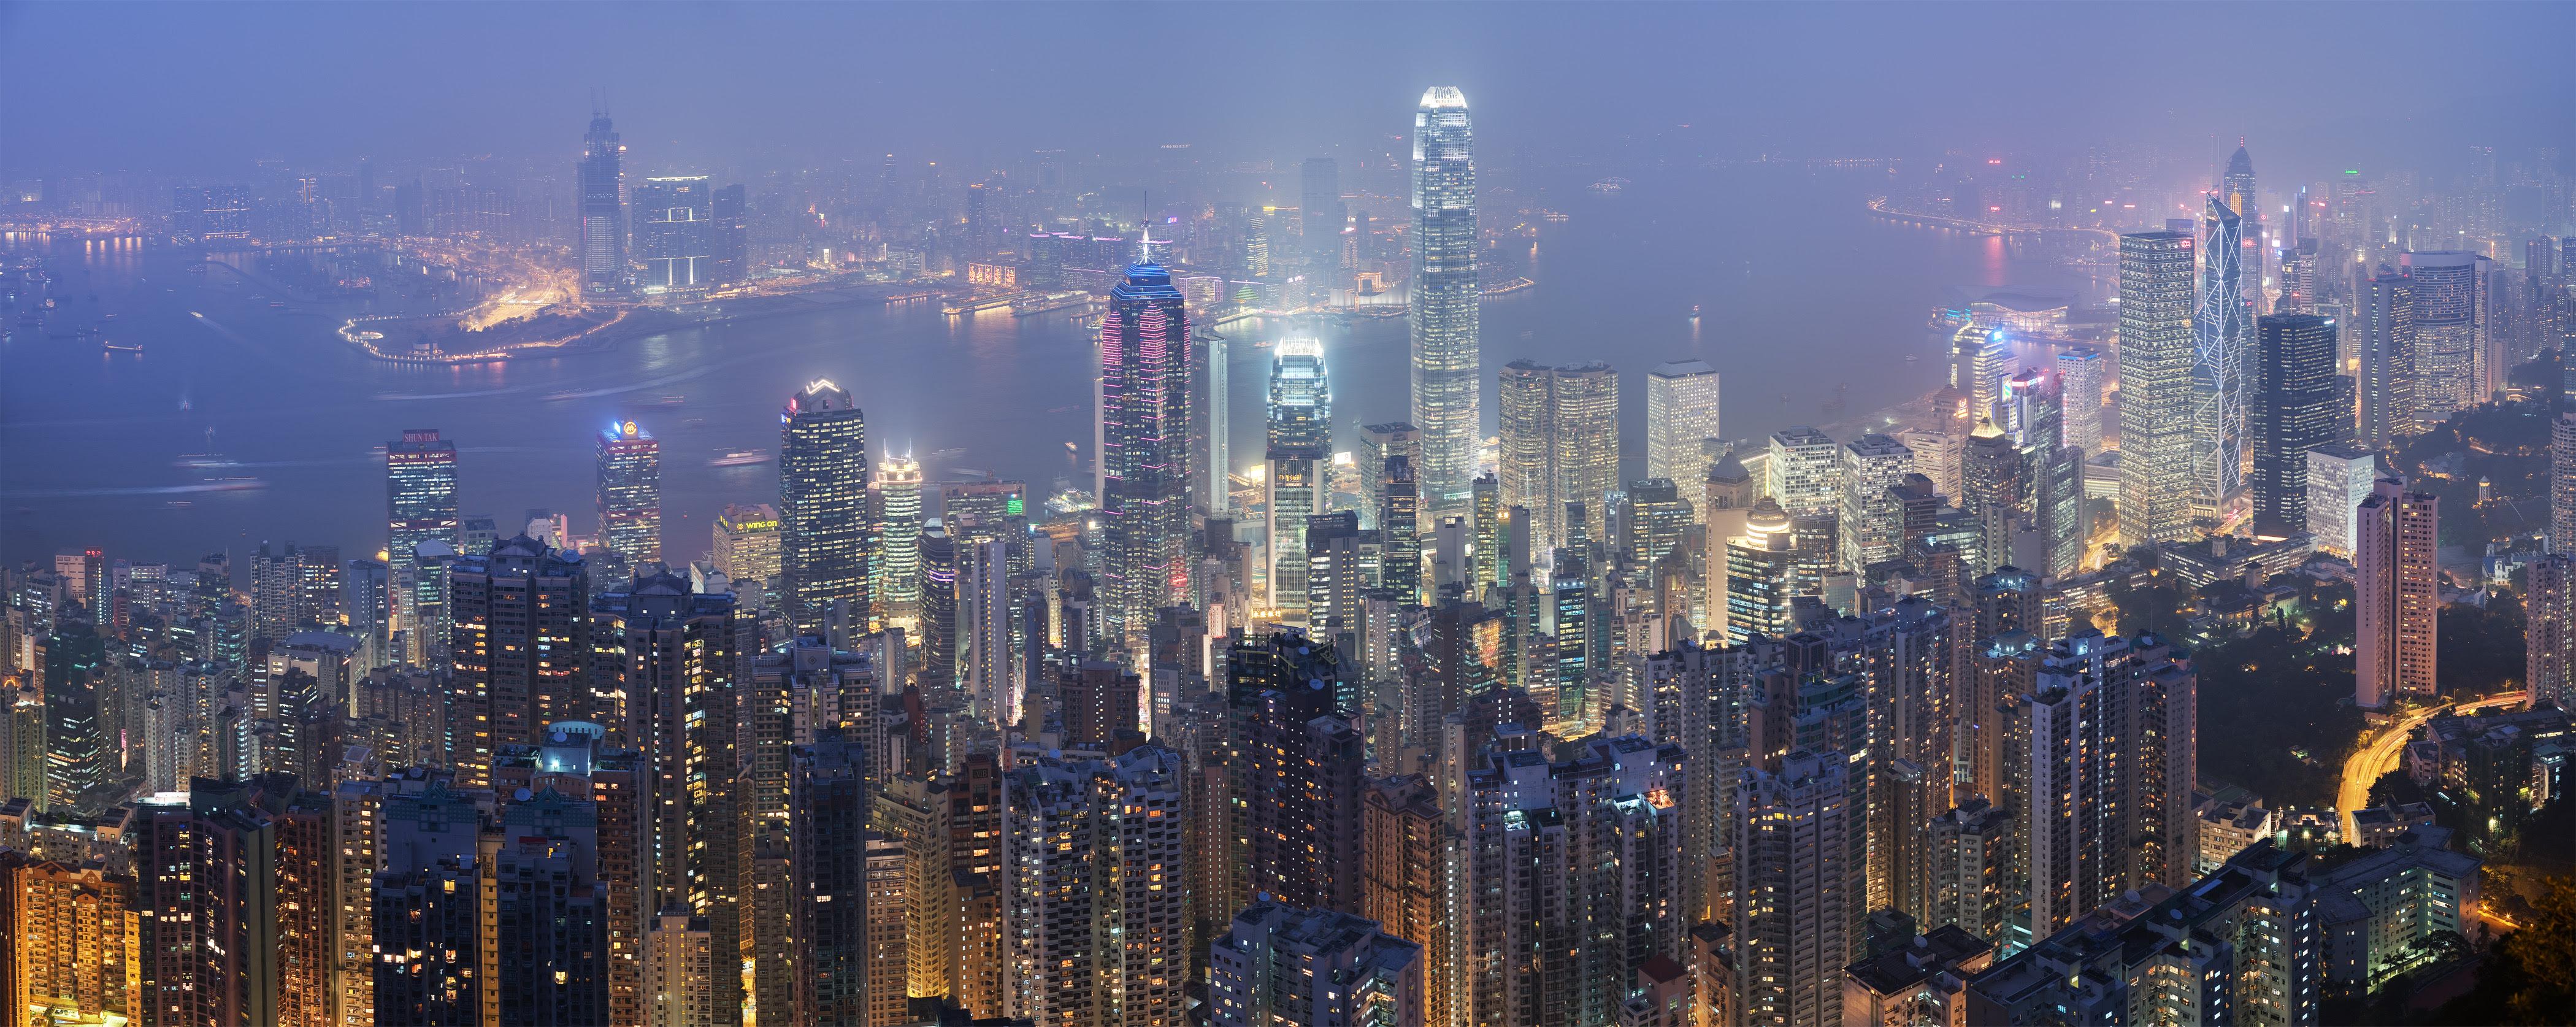 http://upload.wikimedia.org/wikipedia/commons/8/8f/Hong_Kong_Skyline_-_Dec_2007.jpg